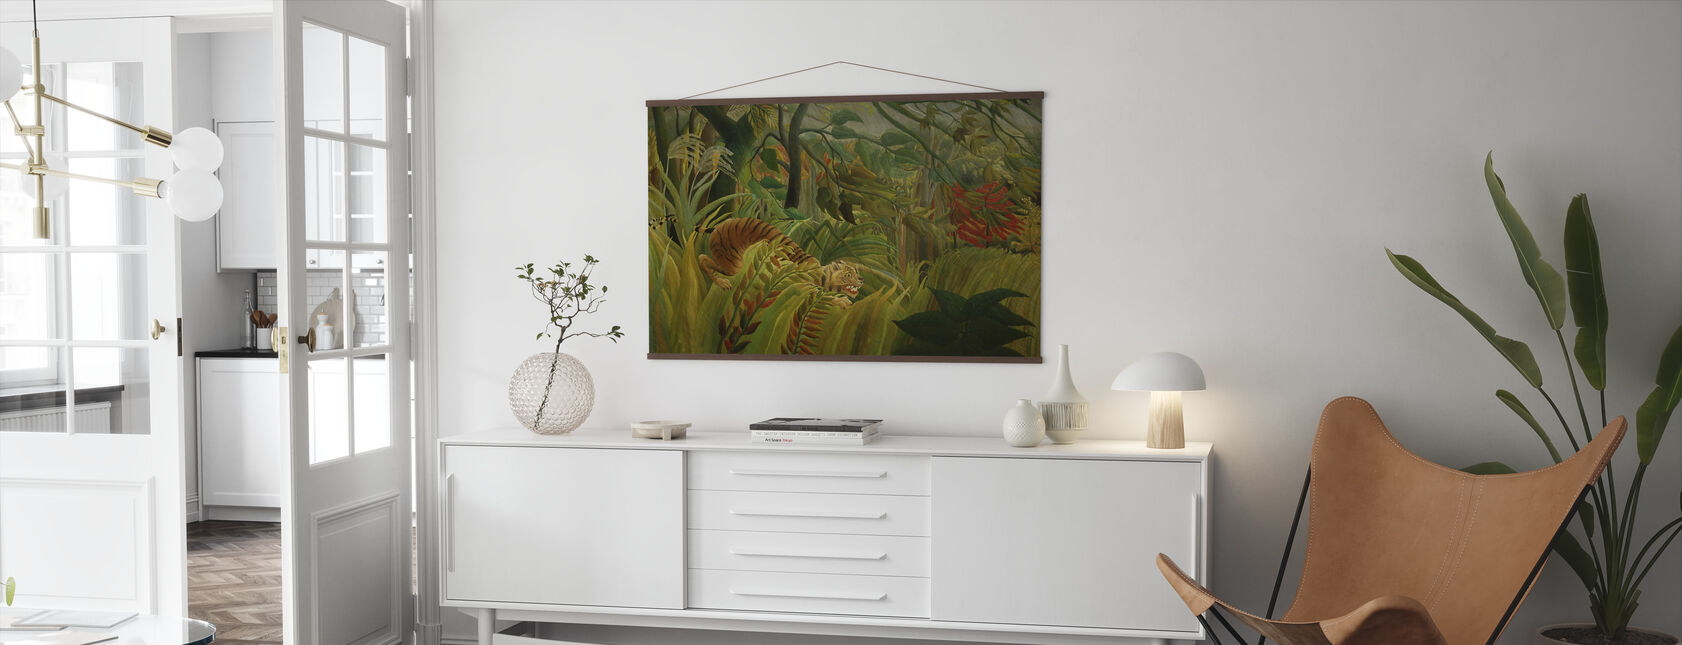 Tigre en una tormenta tropical, Henri Rousseau - Póster - Salón